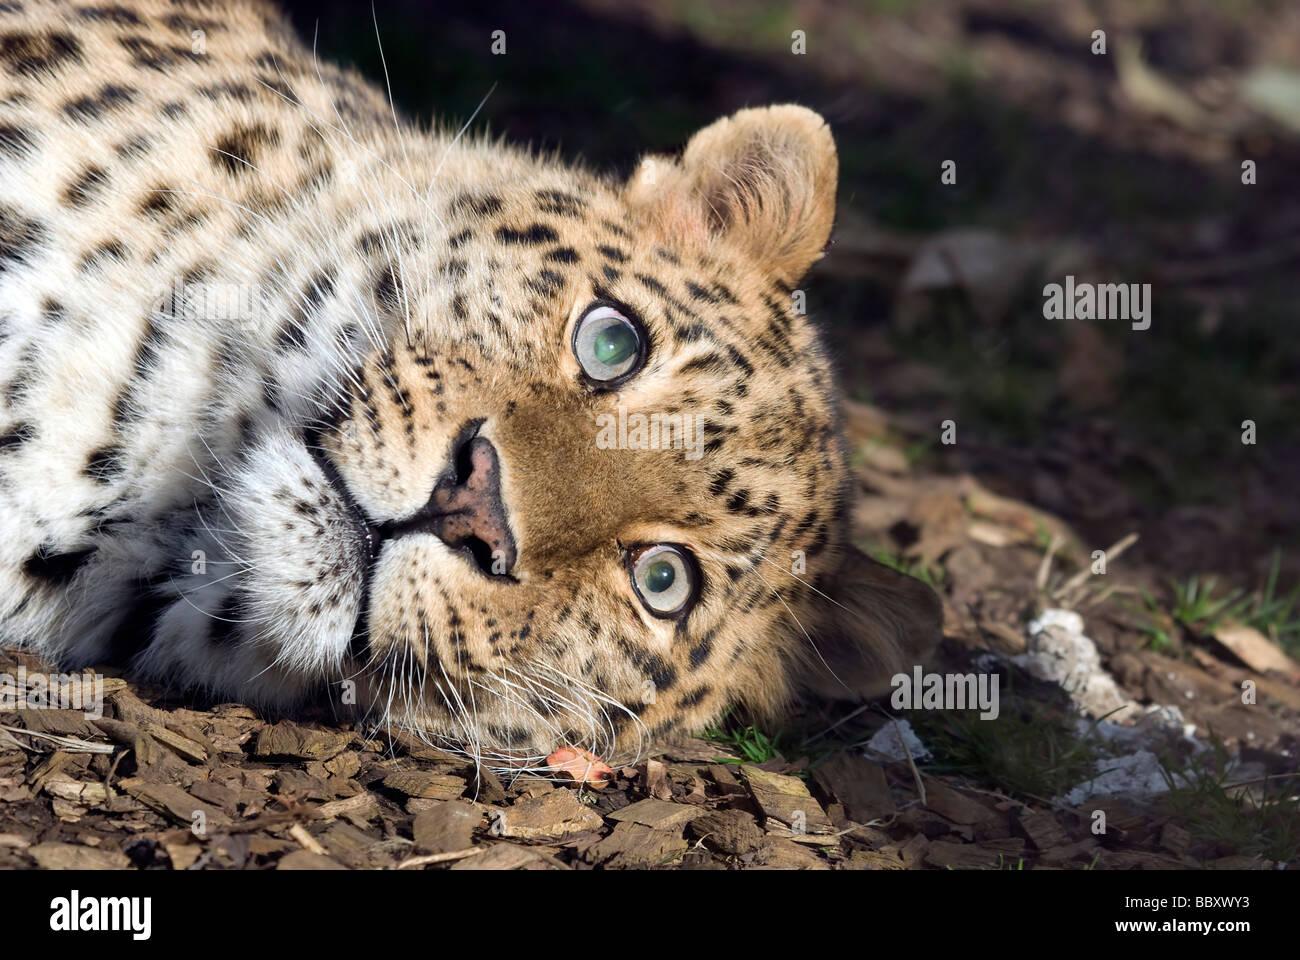 Amur Leopard - Panthera pardus orientalis - Stock Image